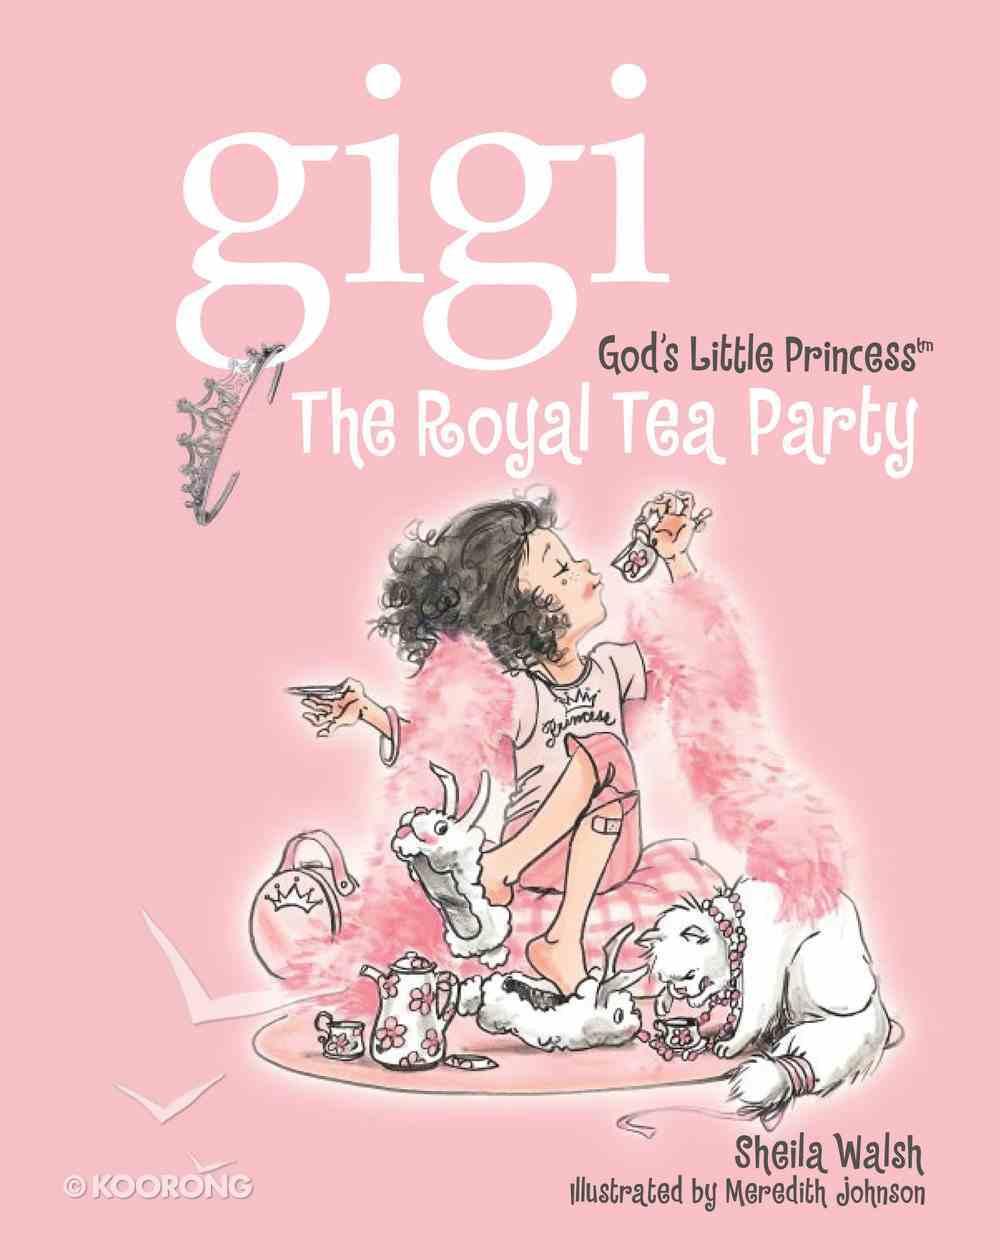 The Royal Tea Party (Gigi, God's Little Princess Series) eBook